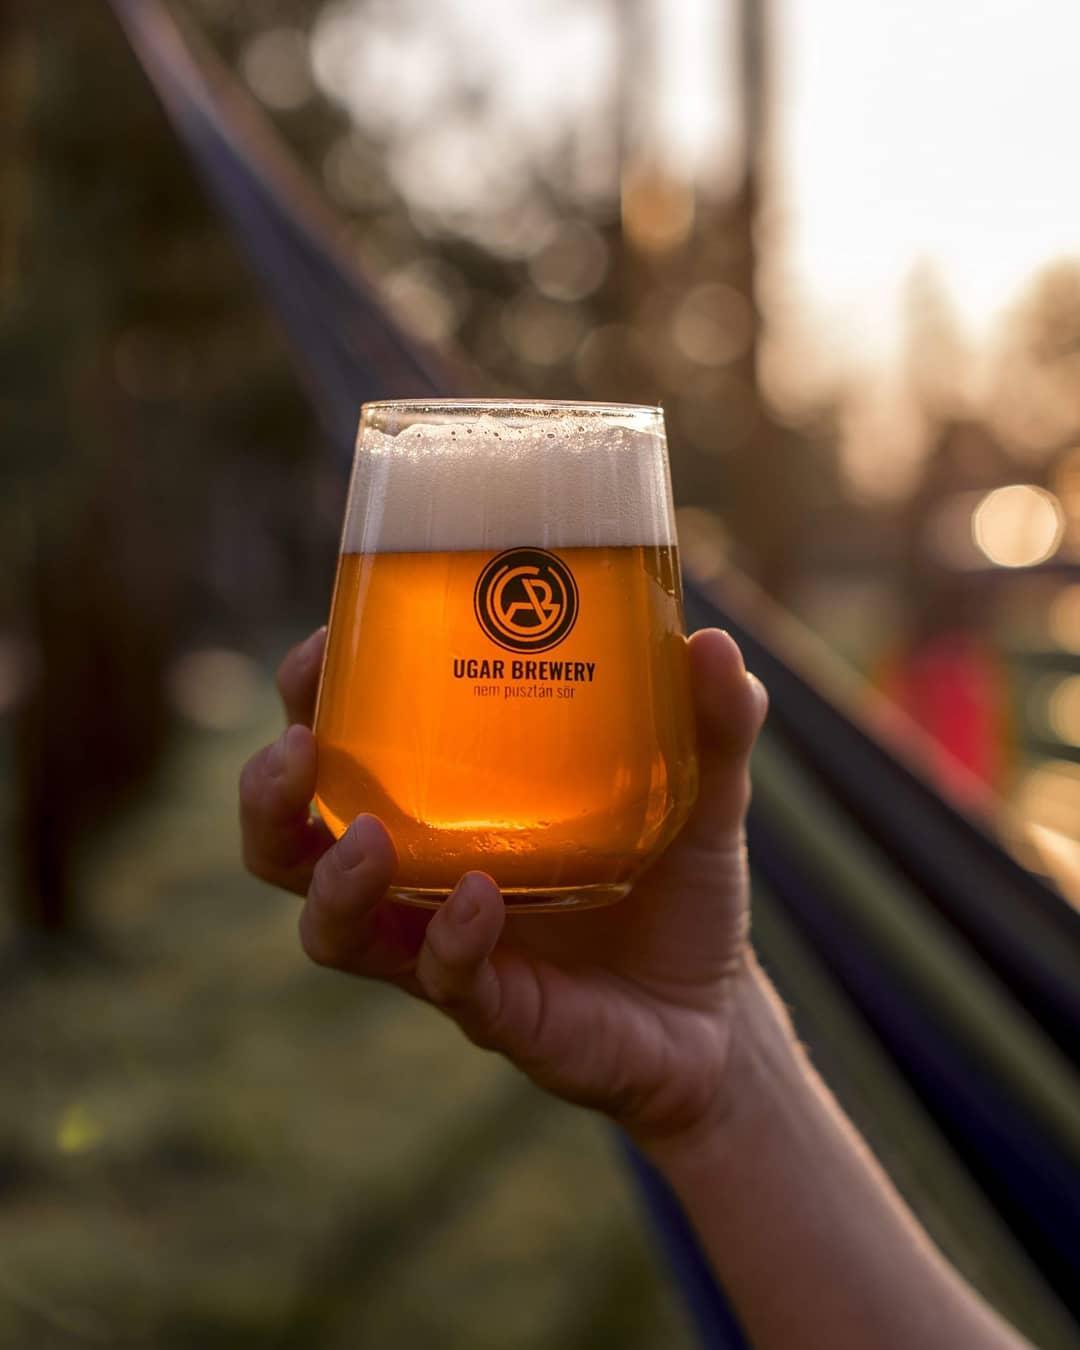 ugar brewery